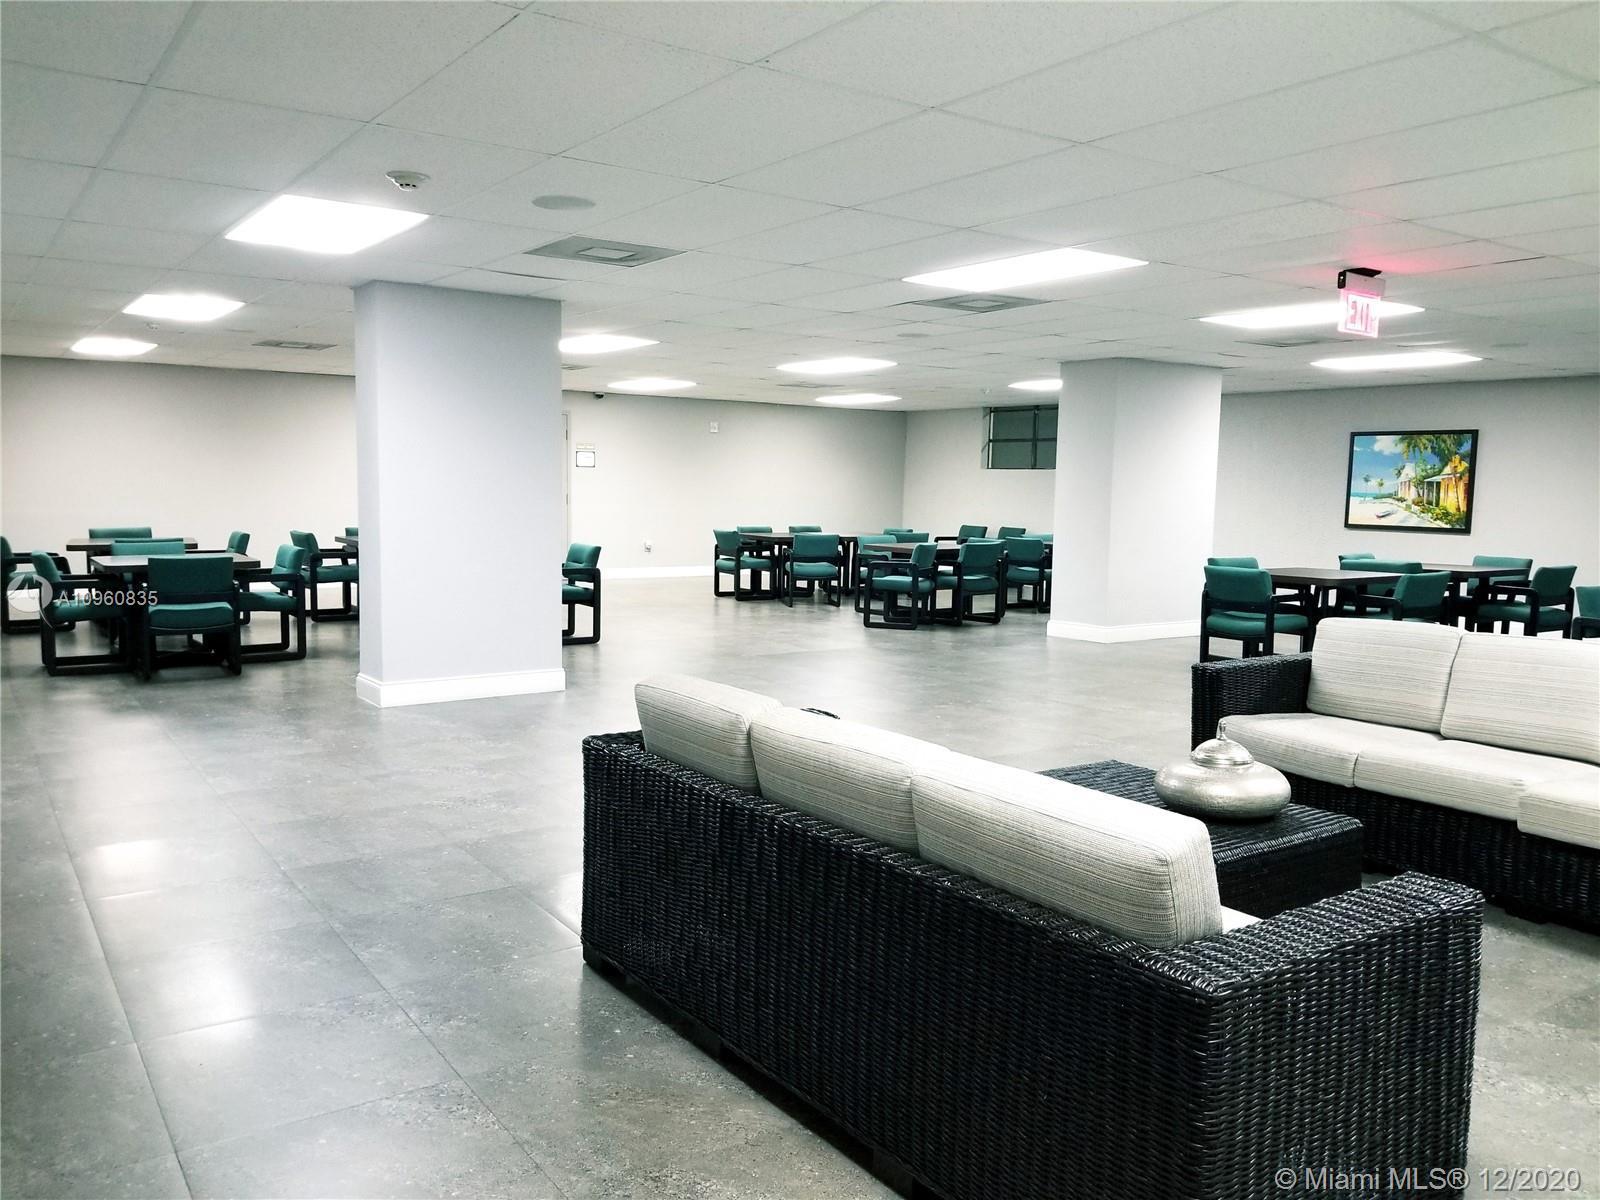 200 Leslie Dr # 322, Hallandale Beach, Florida 33009, 2 Bedrooms Bedrooms, ,2 BathroomsBathrooms,Residential,For Sale,200 Leslie Dr # 322,A10960835